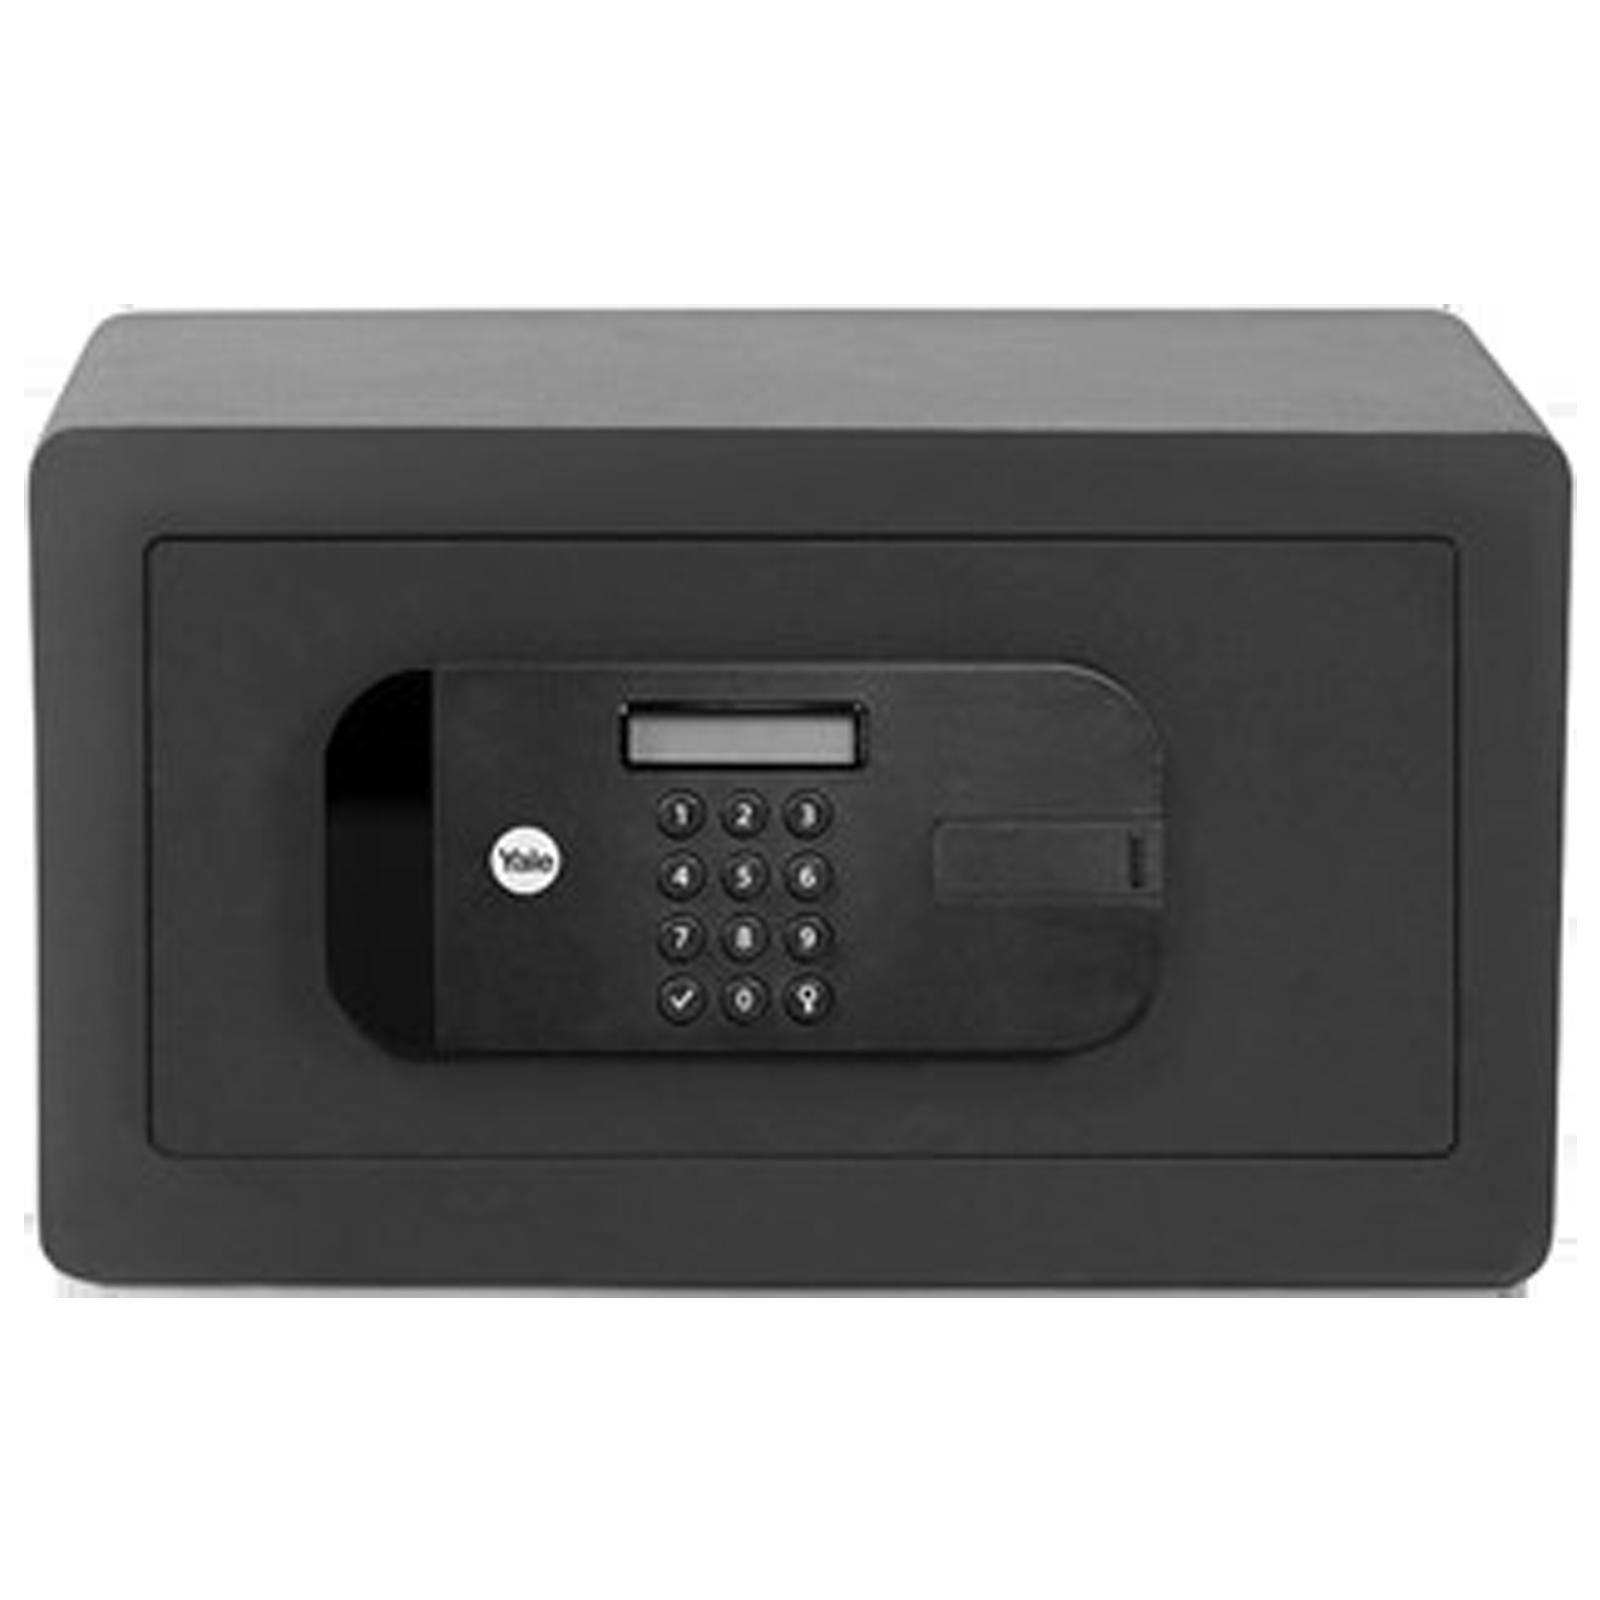 Yale 9.6 Litres Digital Safety Locker (1 Shelve, YSEB/200/EB1, Black)_1